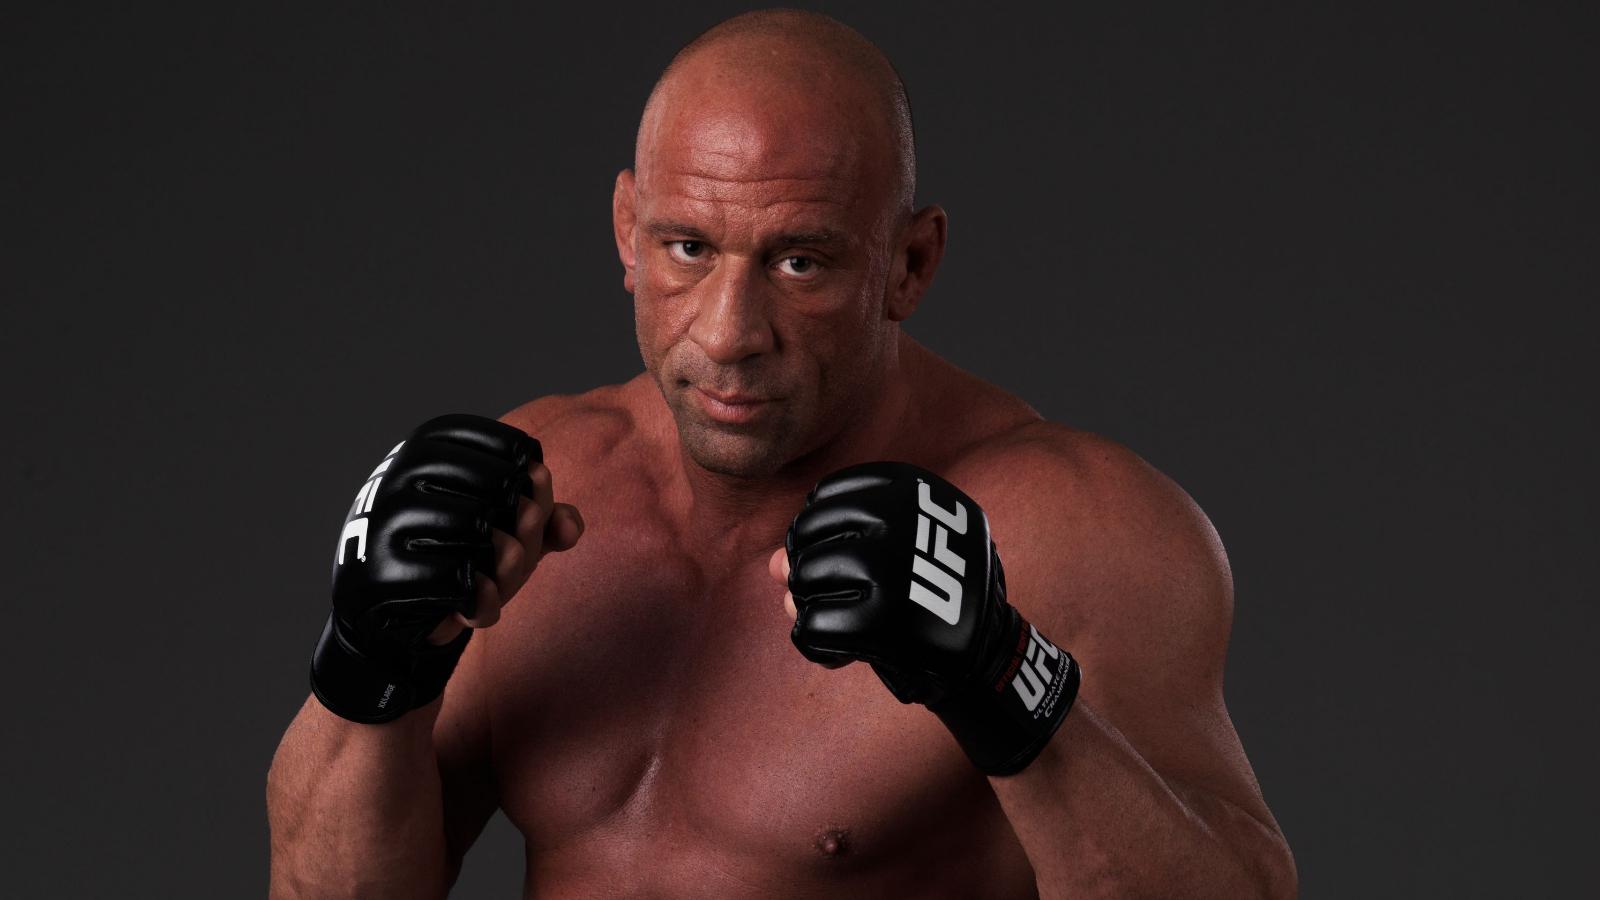 Mark Coleman - UFC/MMA